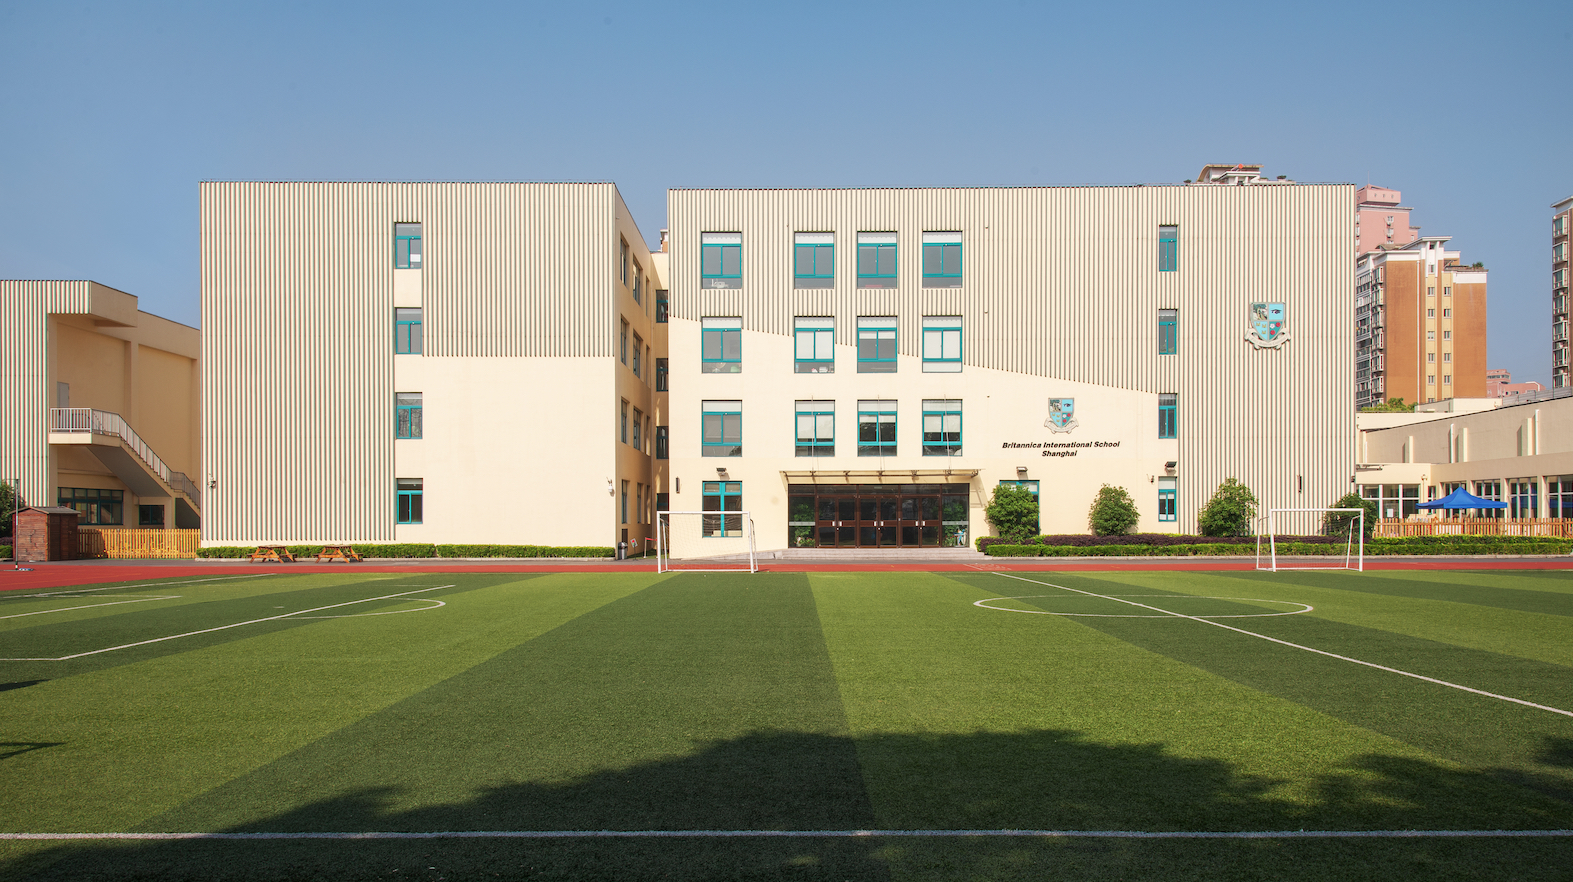 Britannica International School, Shanghai Shanghai